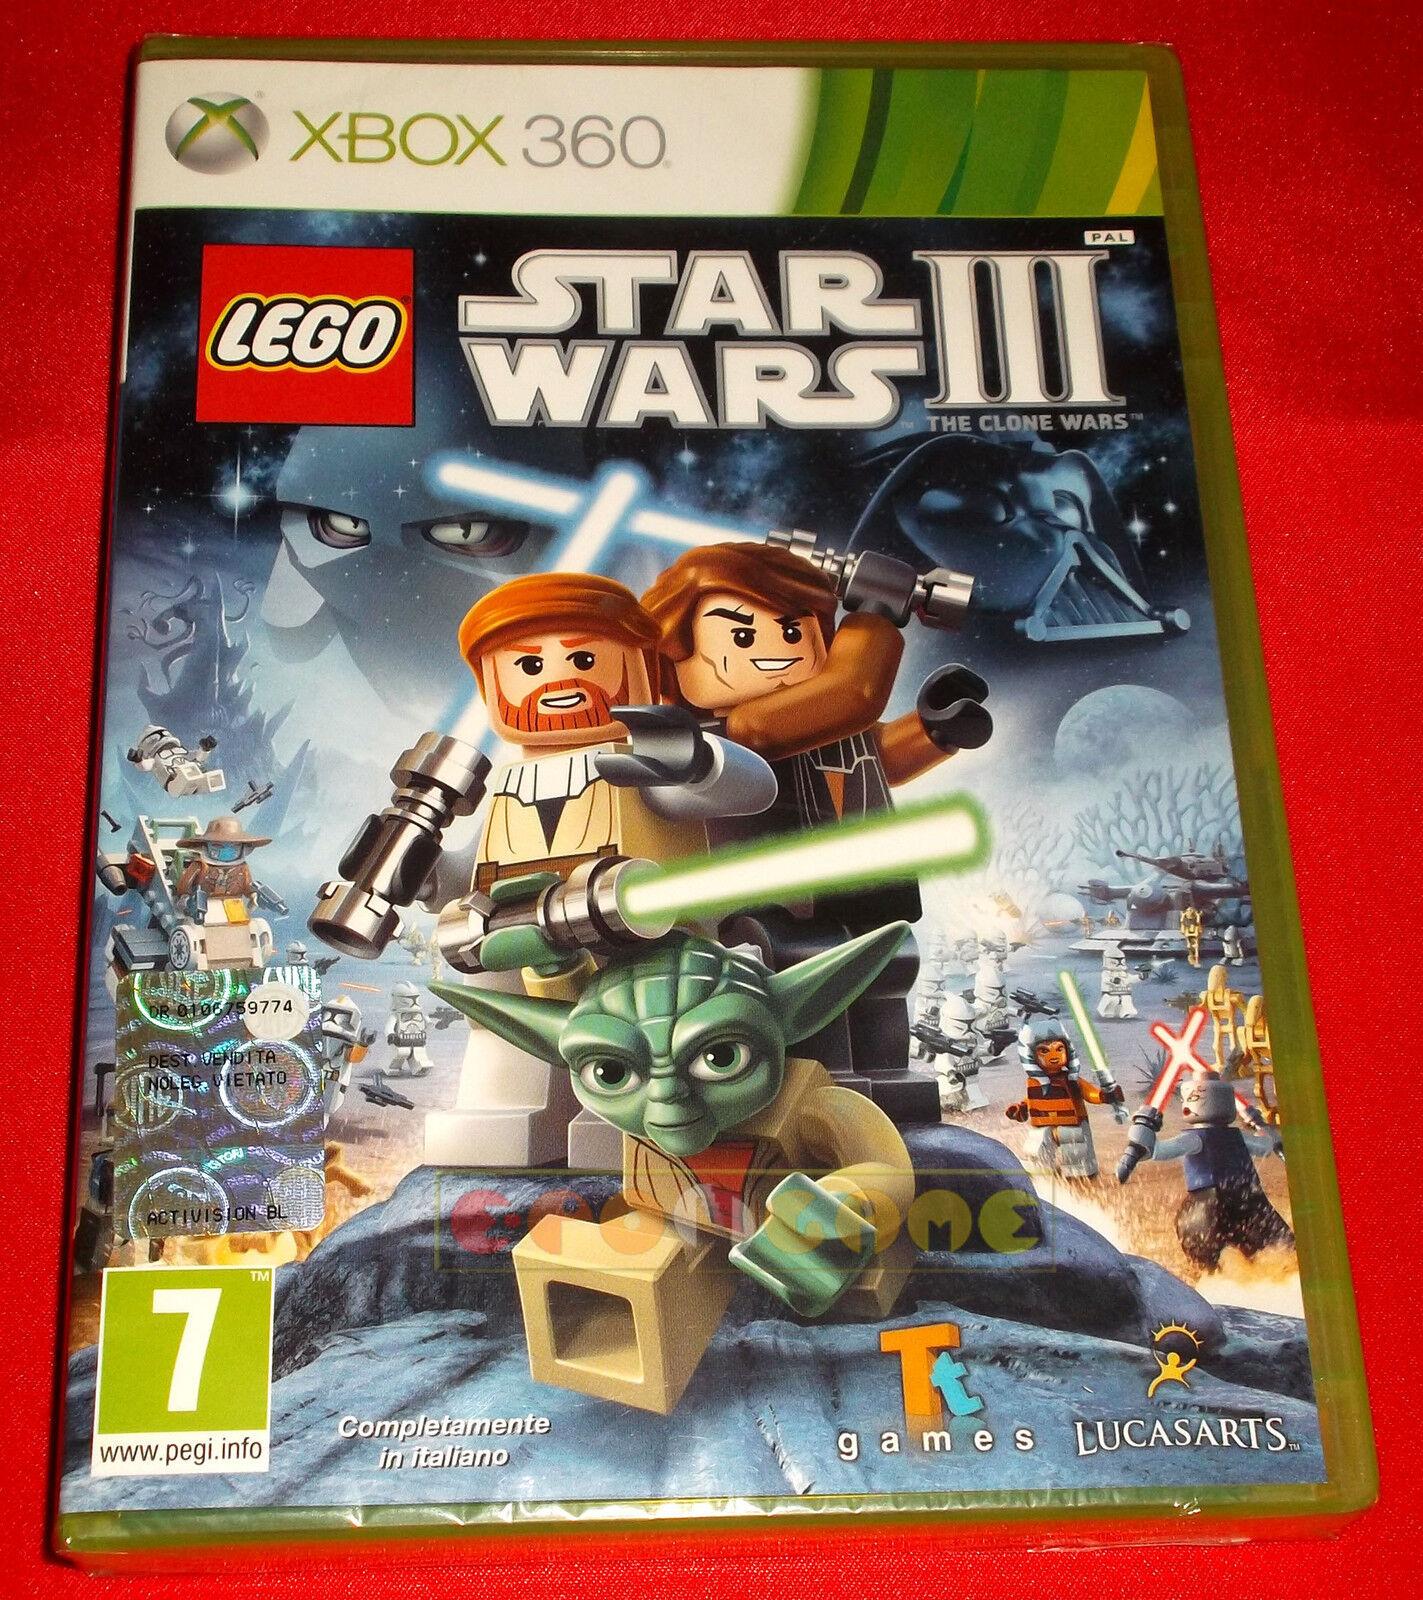 LEGO STAR WARS III 3 THE CLONE WARS XBOX 360 - pas cher StarWars